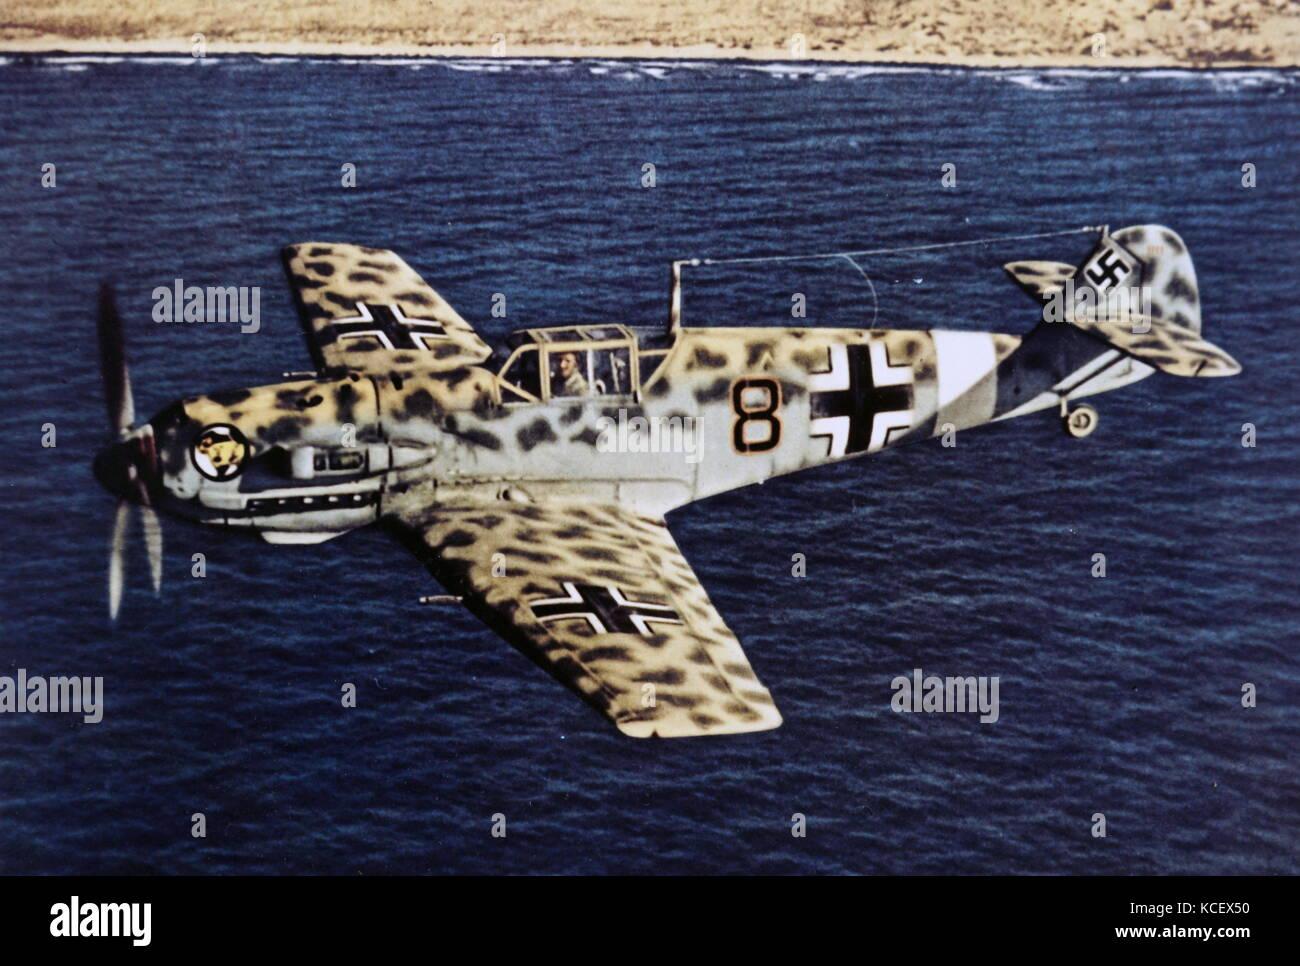 Photograph of a Messerschmitt Bf 109, a German World War II fighter aircraft, flying over Africa. Dated 20th Century - Stock Image